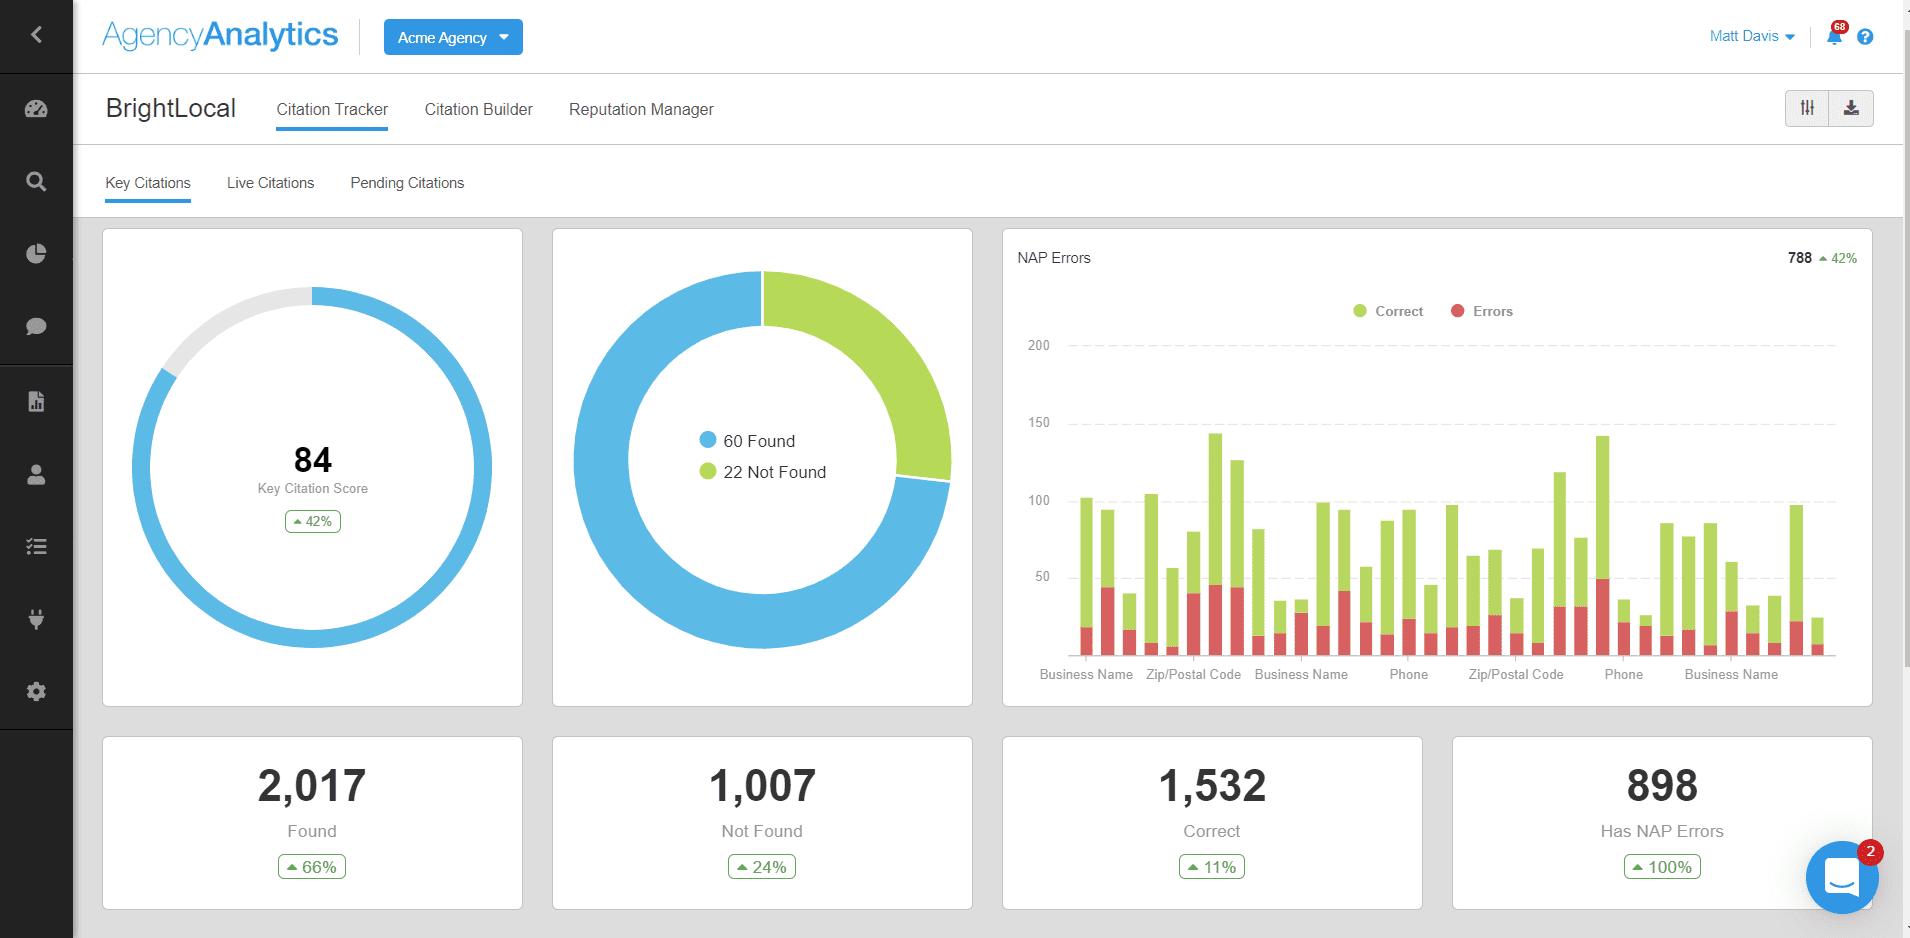 BrightLocal's Citation Tracker in AgencyAnalytics